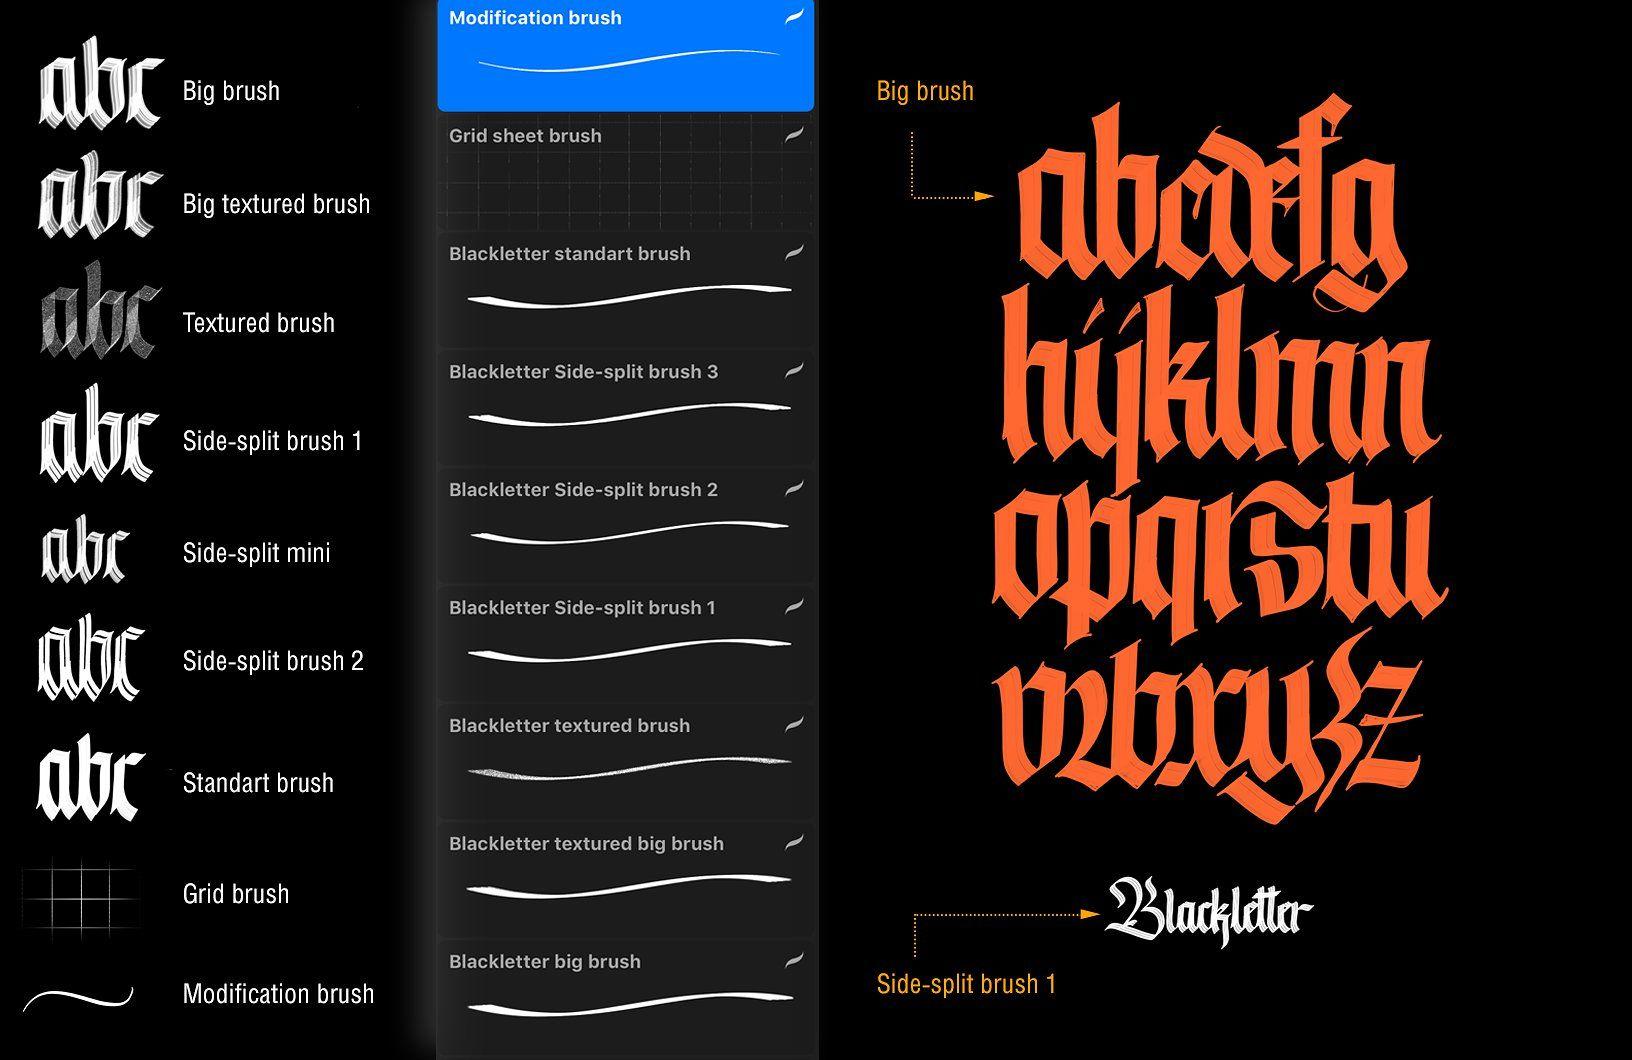 Download Blackletter Brush Pack for Procreate | Creative words ...